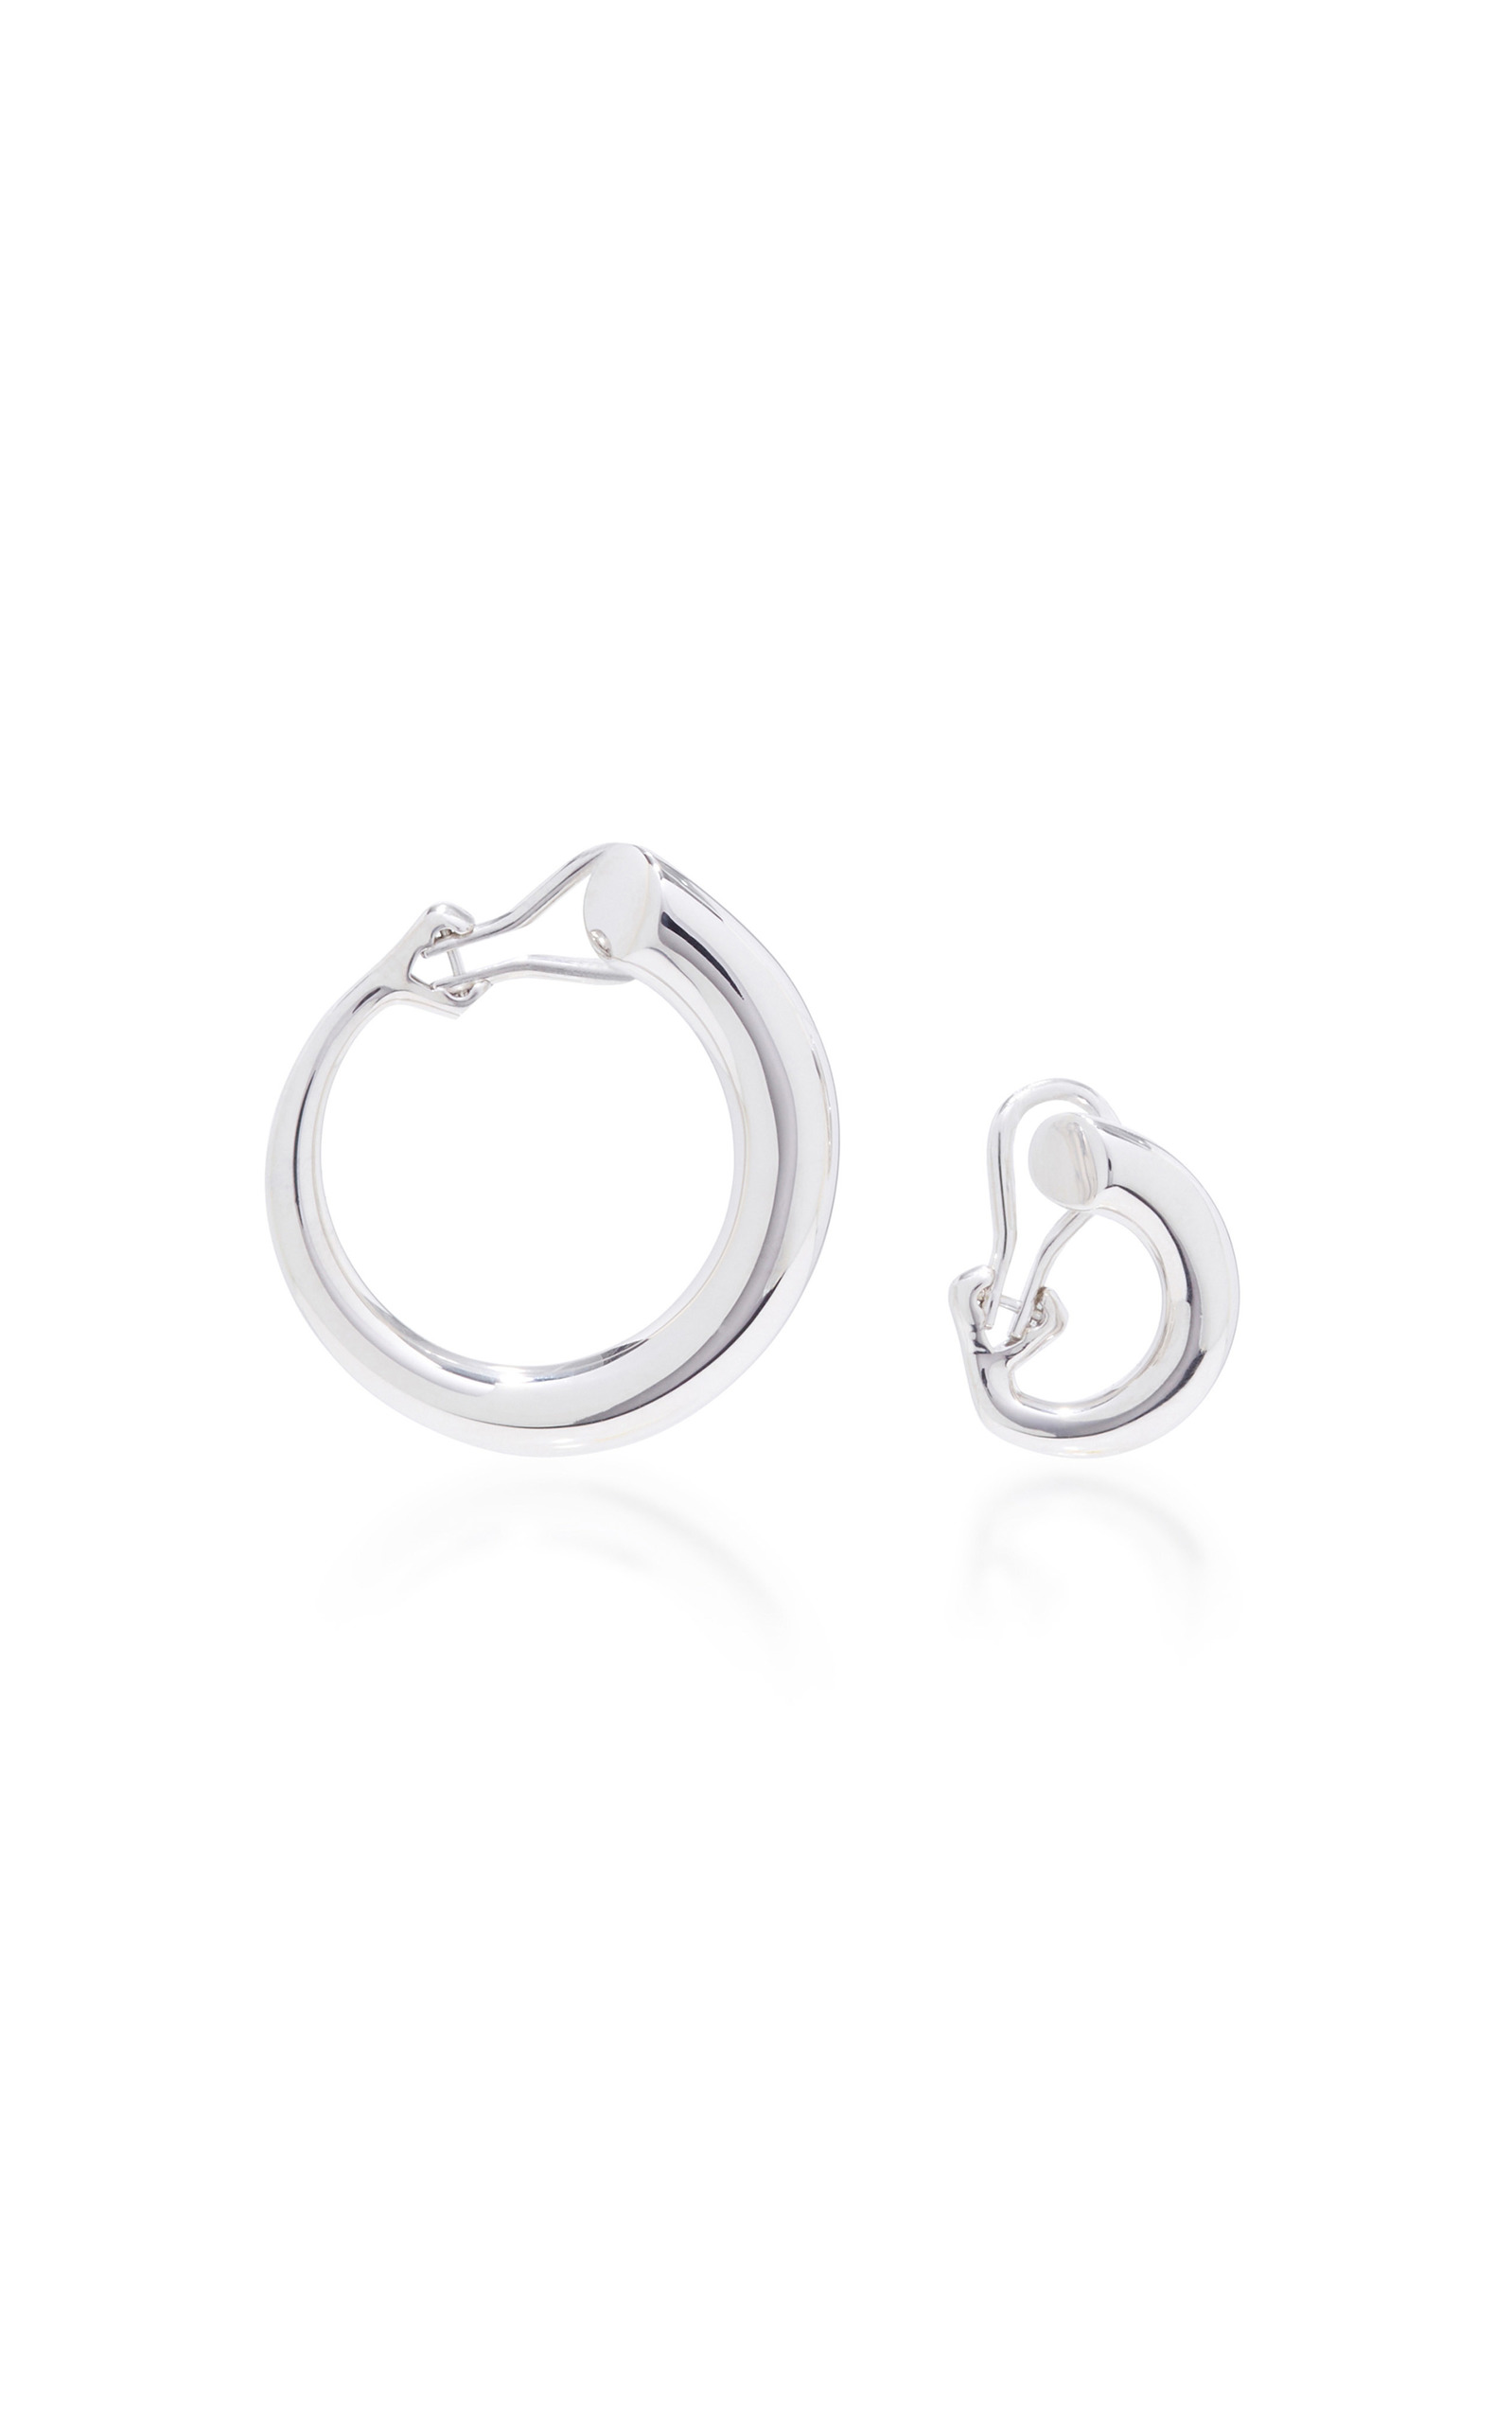 Charlotte Chesnais Monie Small Medium Earrings - Silver S4IelLH